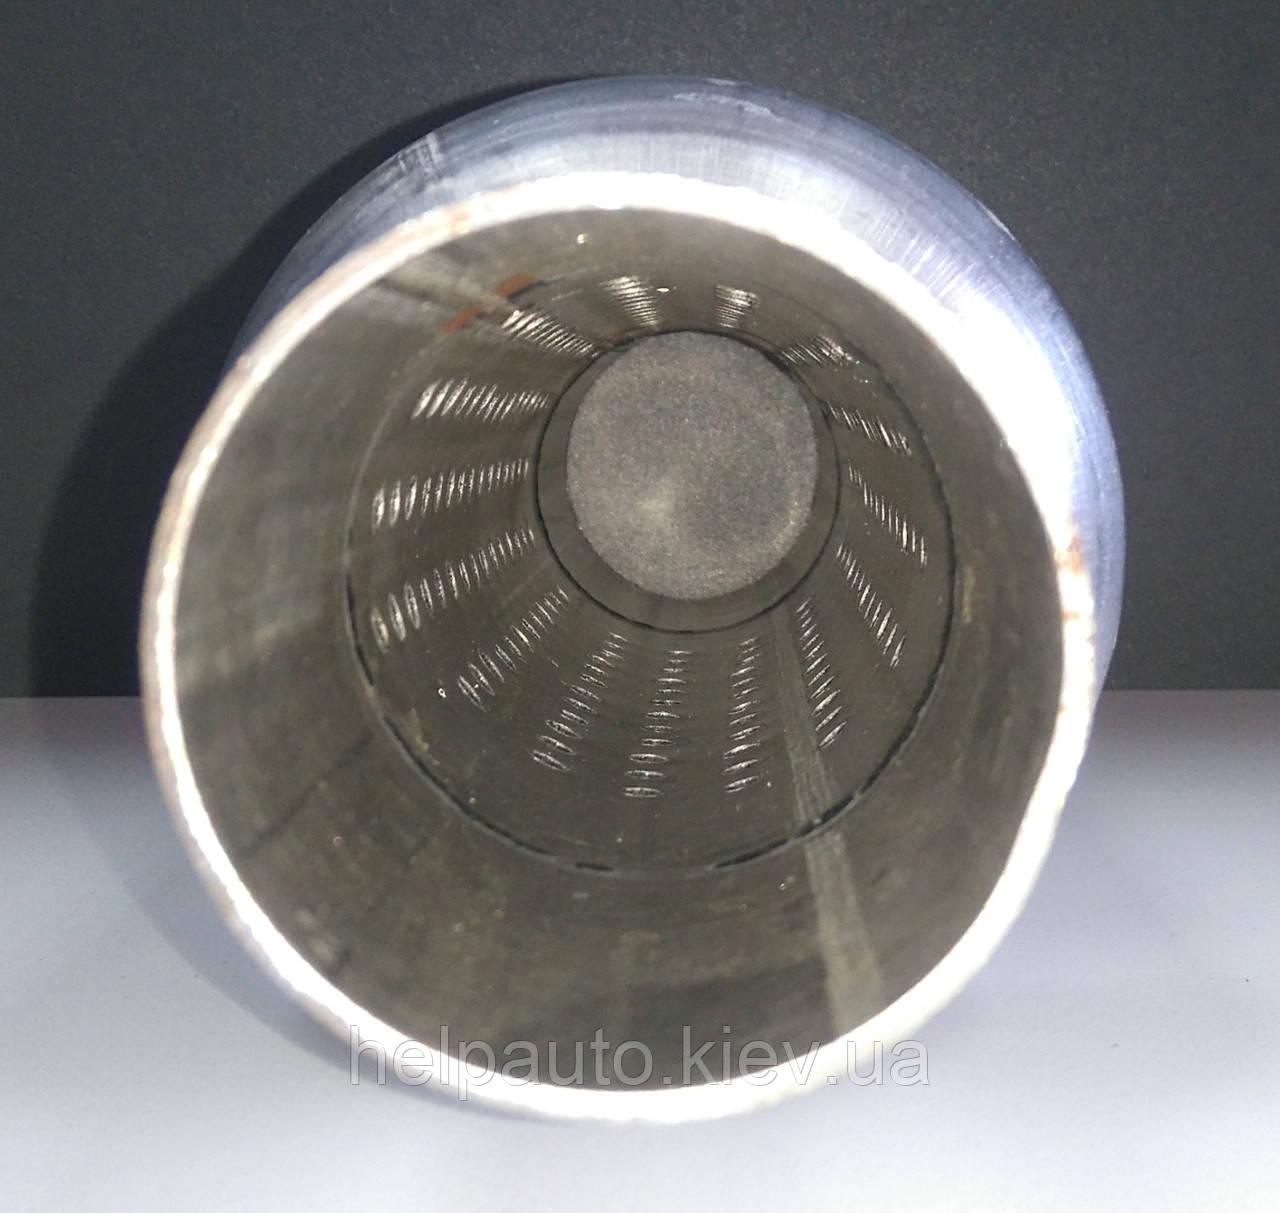 Резонатор (пламегаситель) 60/300  AWG POLONEZ